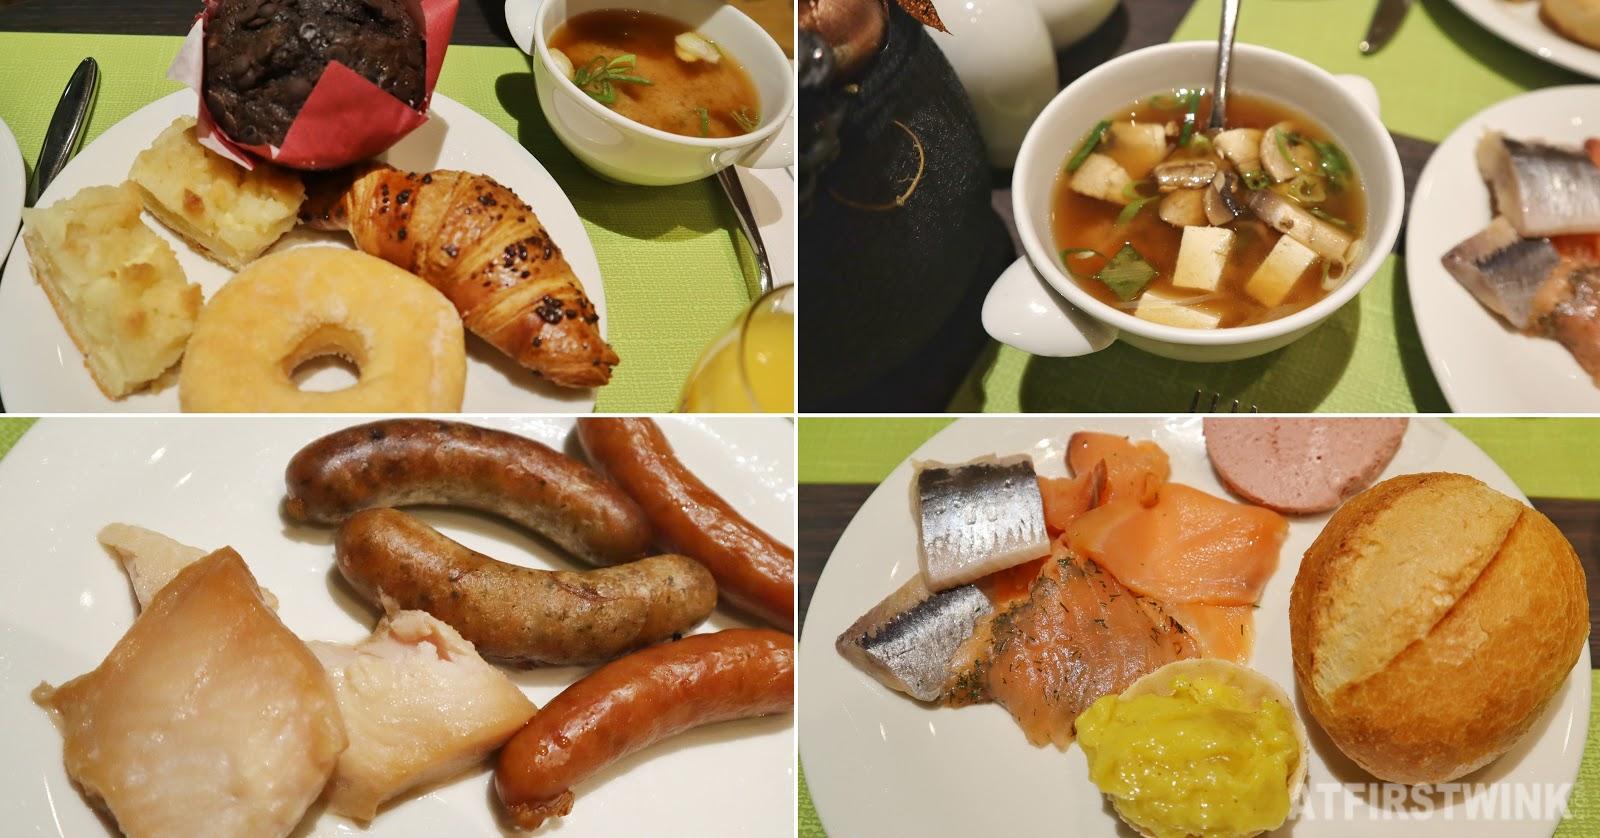 Hotel nikko breakfast buffet pastries miso soup fish